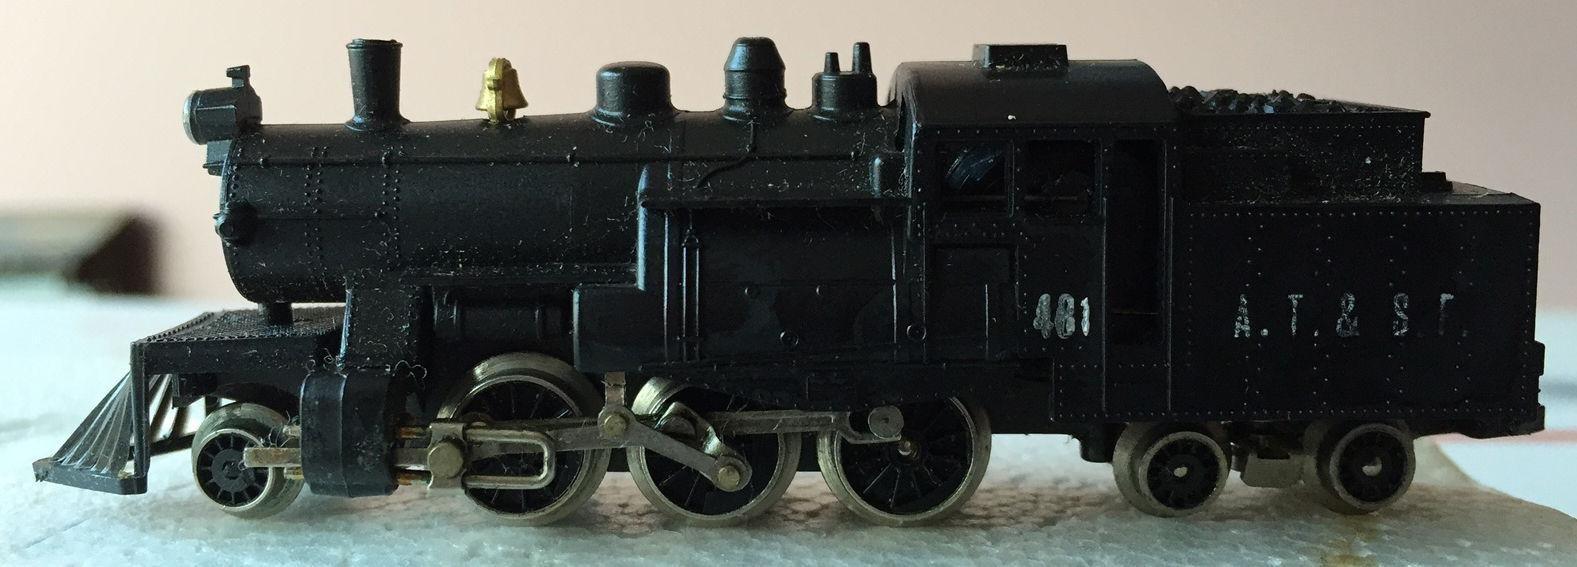 N Scale - Lima - 254 - Locomotive, Steam, 2-6-4T - Santa Fe - 481